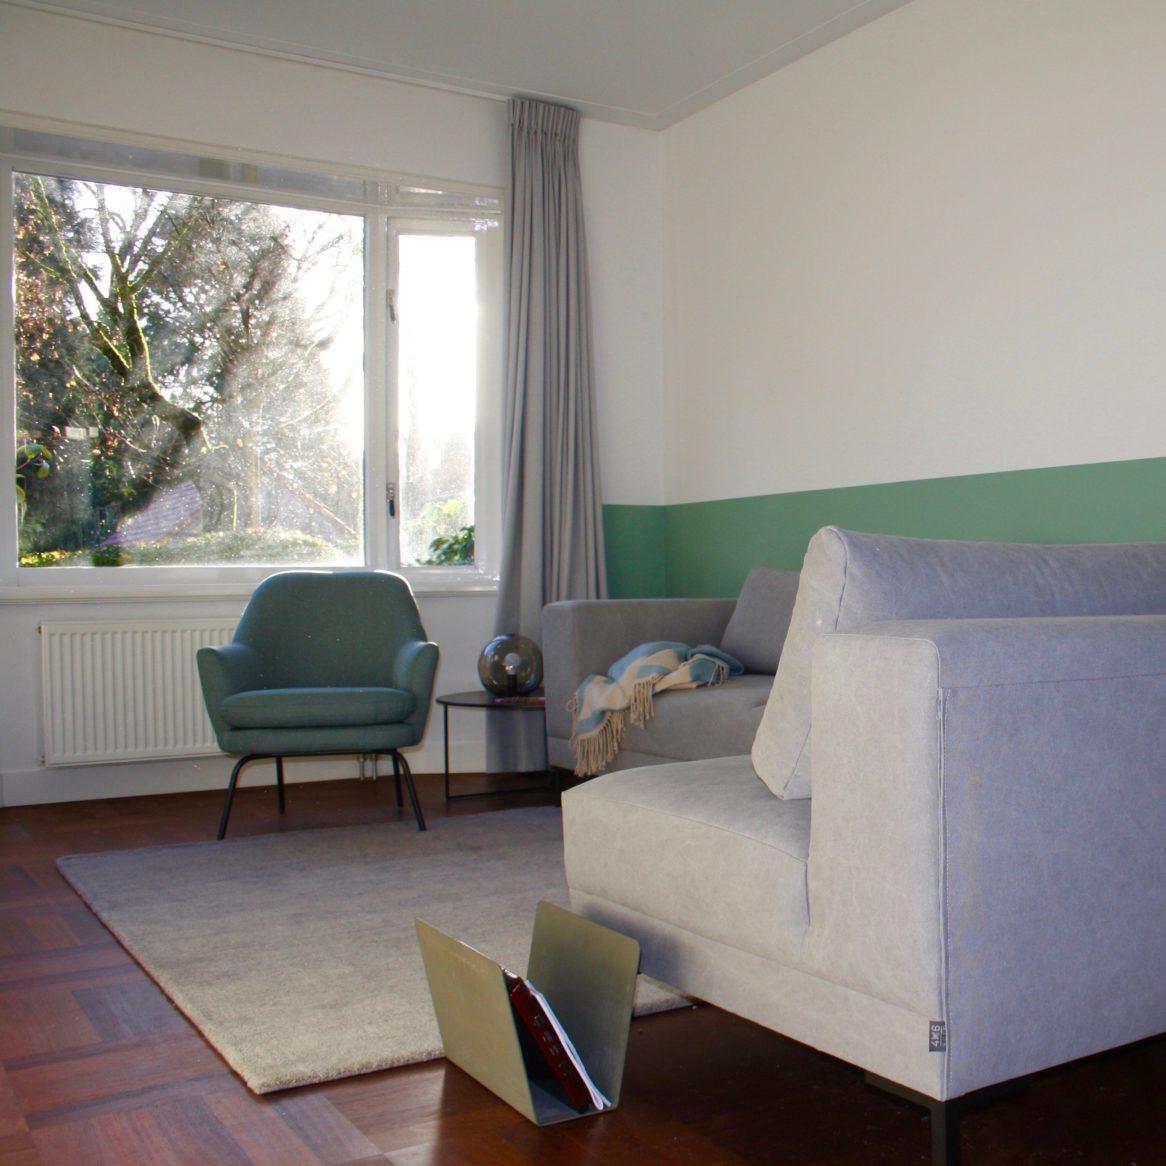 Groen wit interieur